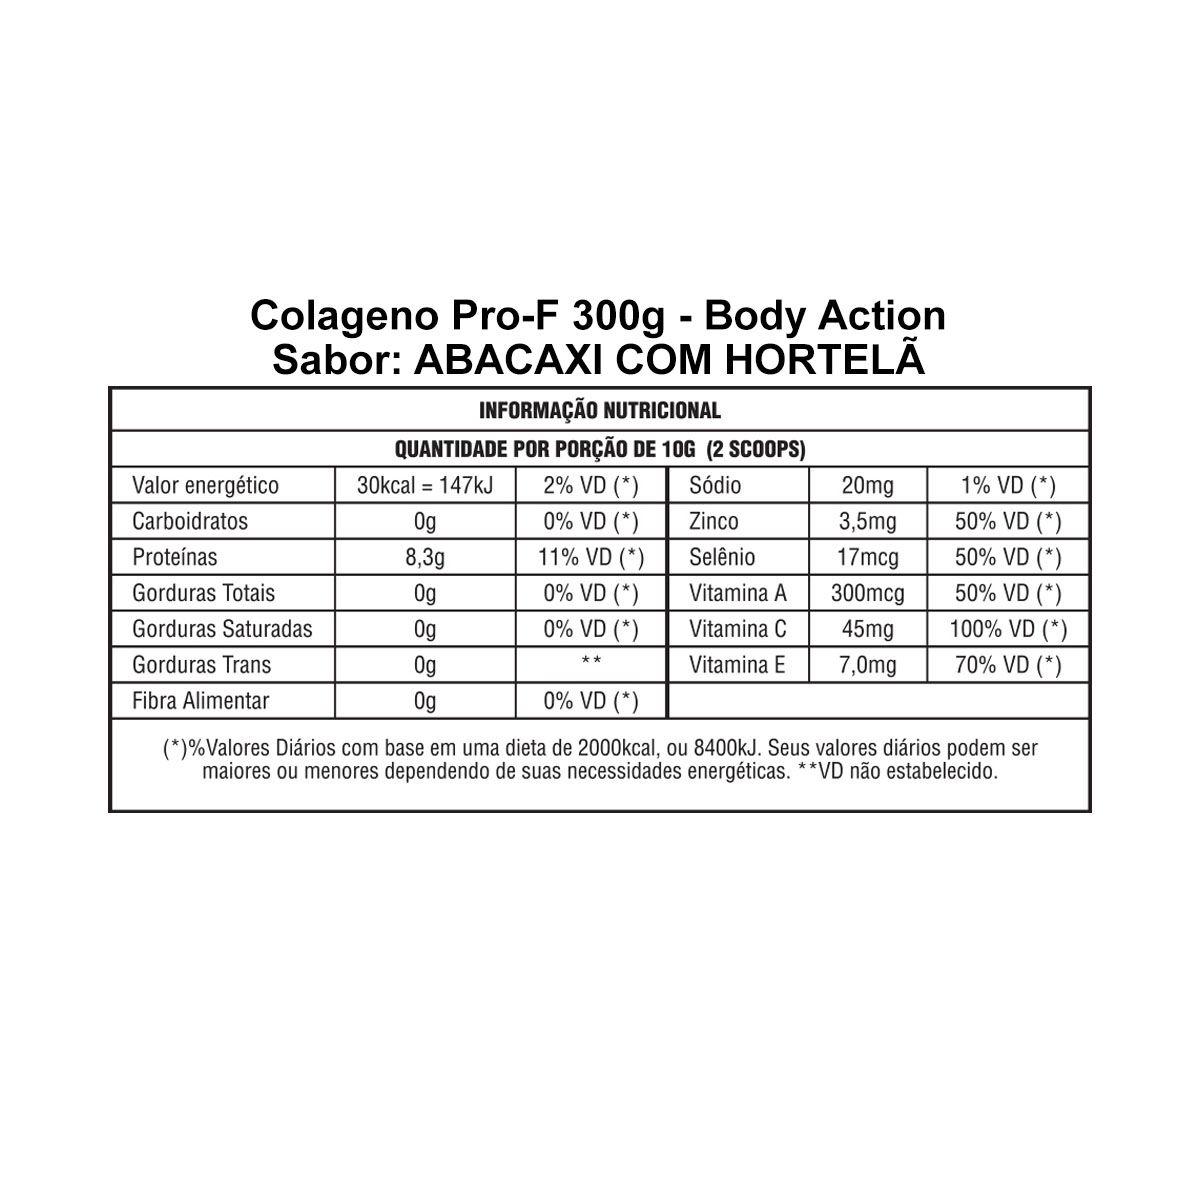 Colágeno Pro-F 300g - Body Action